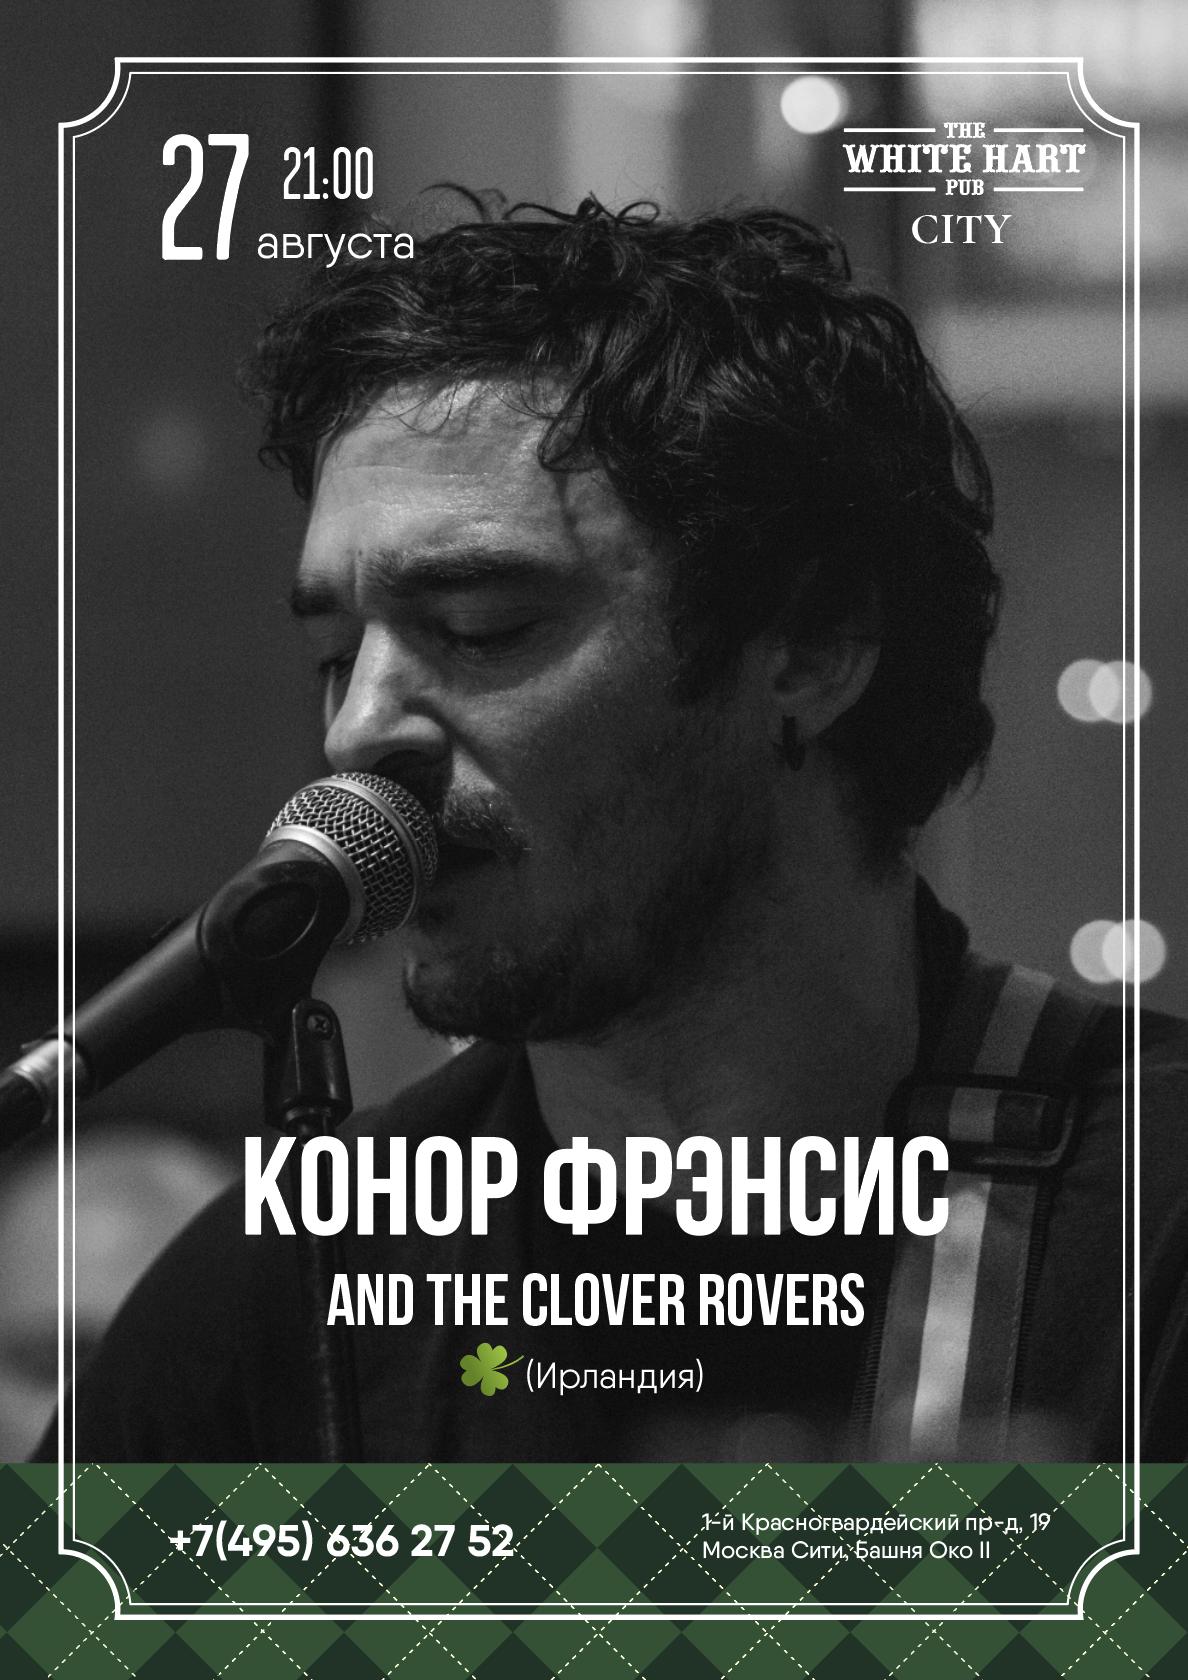 Афиша! 27 августа — Ирландский певец Конор Фрэнсис  в White Hart Pub Moscow City